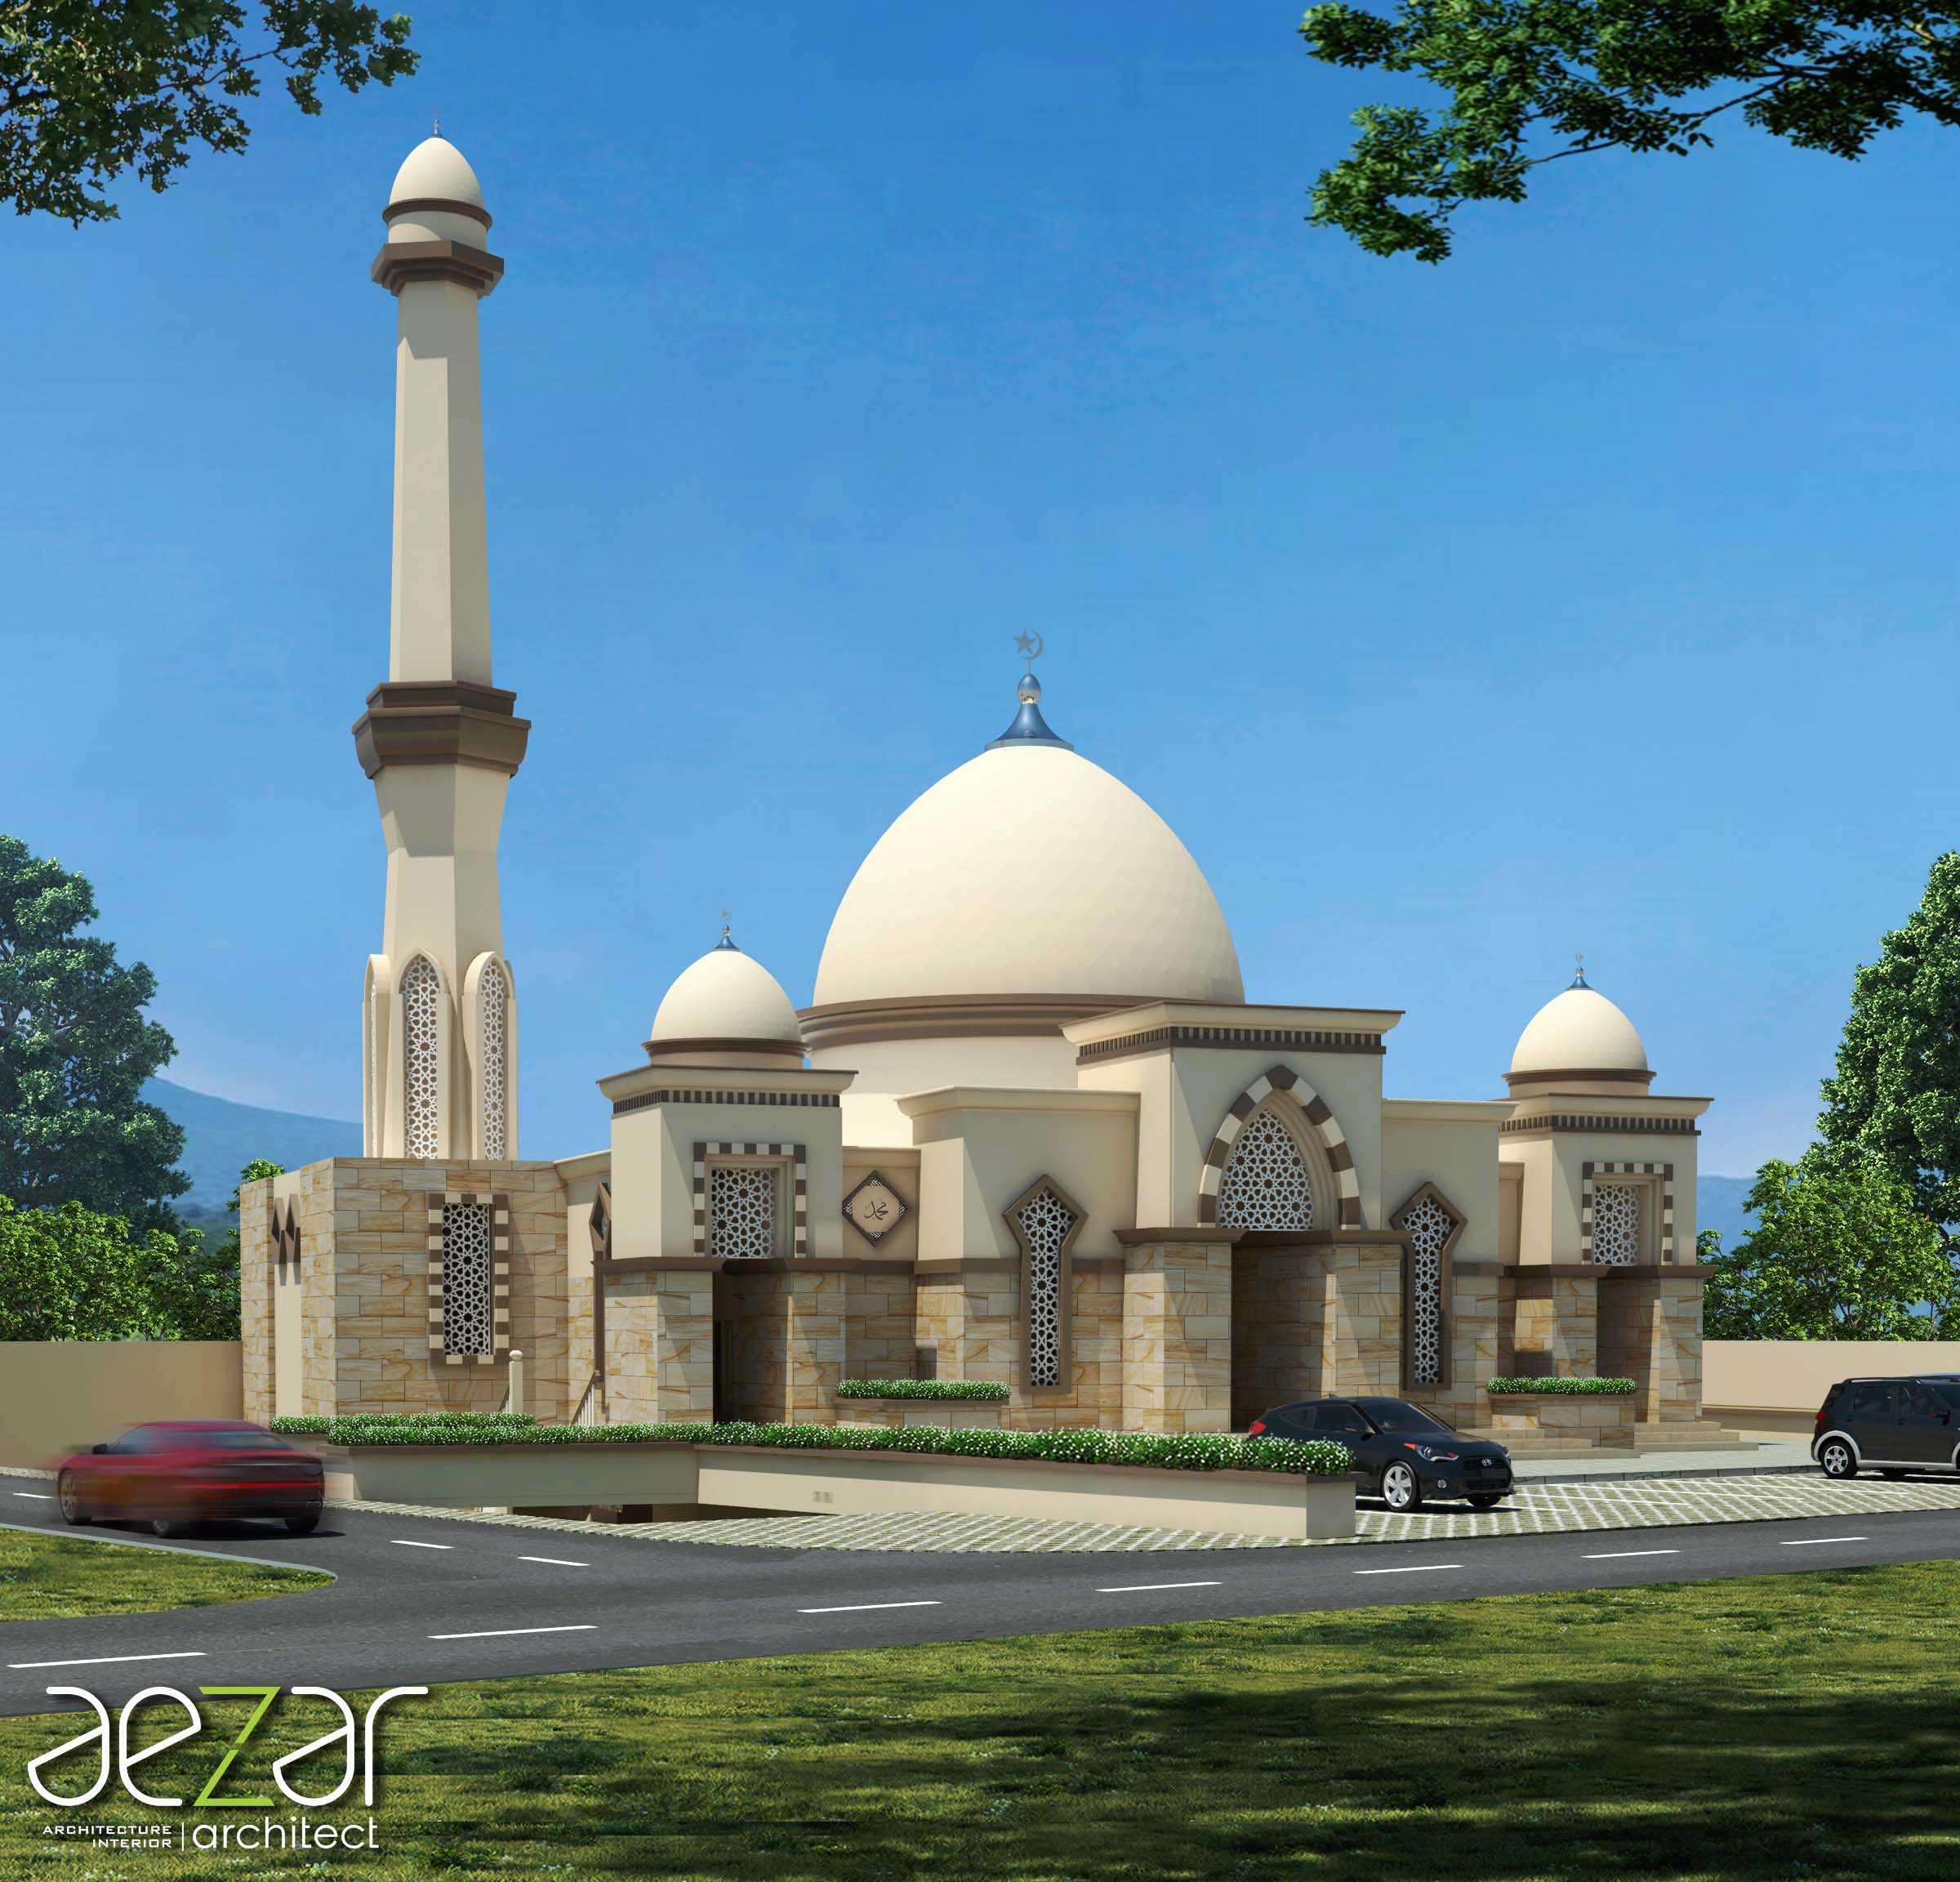 Aezar Architect Baitussalam Mosque Kabupaten Sragen, Jawa Tengah, Indonesia Kabupaten Sragen, Jawa Tengah, Indonesia Exterior View   54436